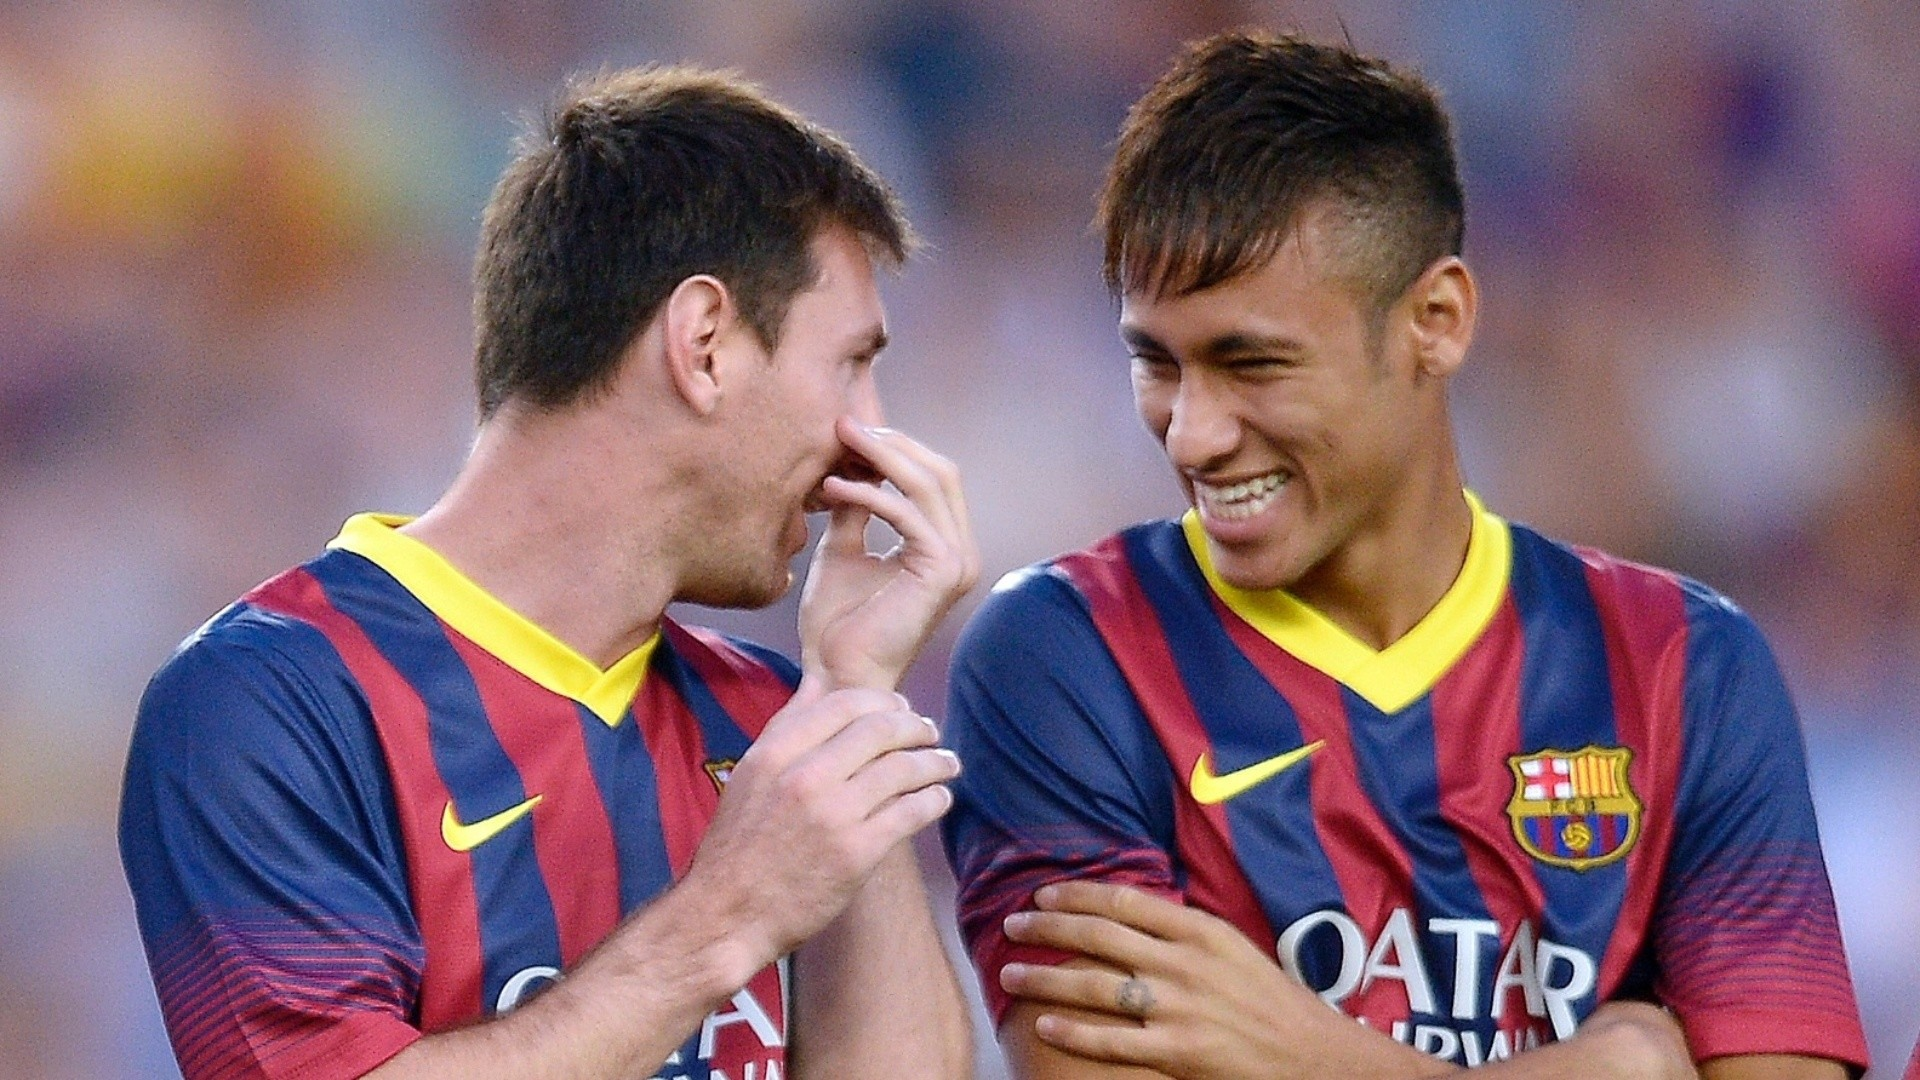 Barcelona legend Leo Messi produced a ridiculous pass for Neymar goal v  Roma (Video)